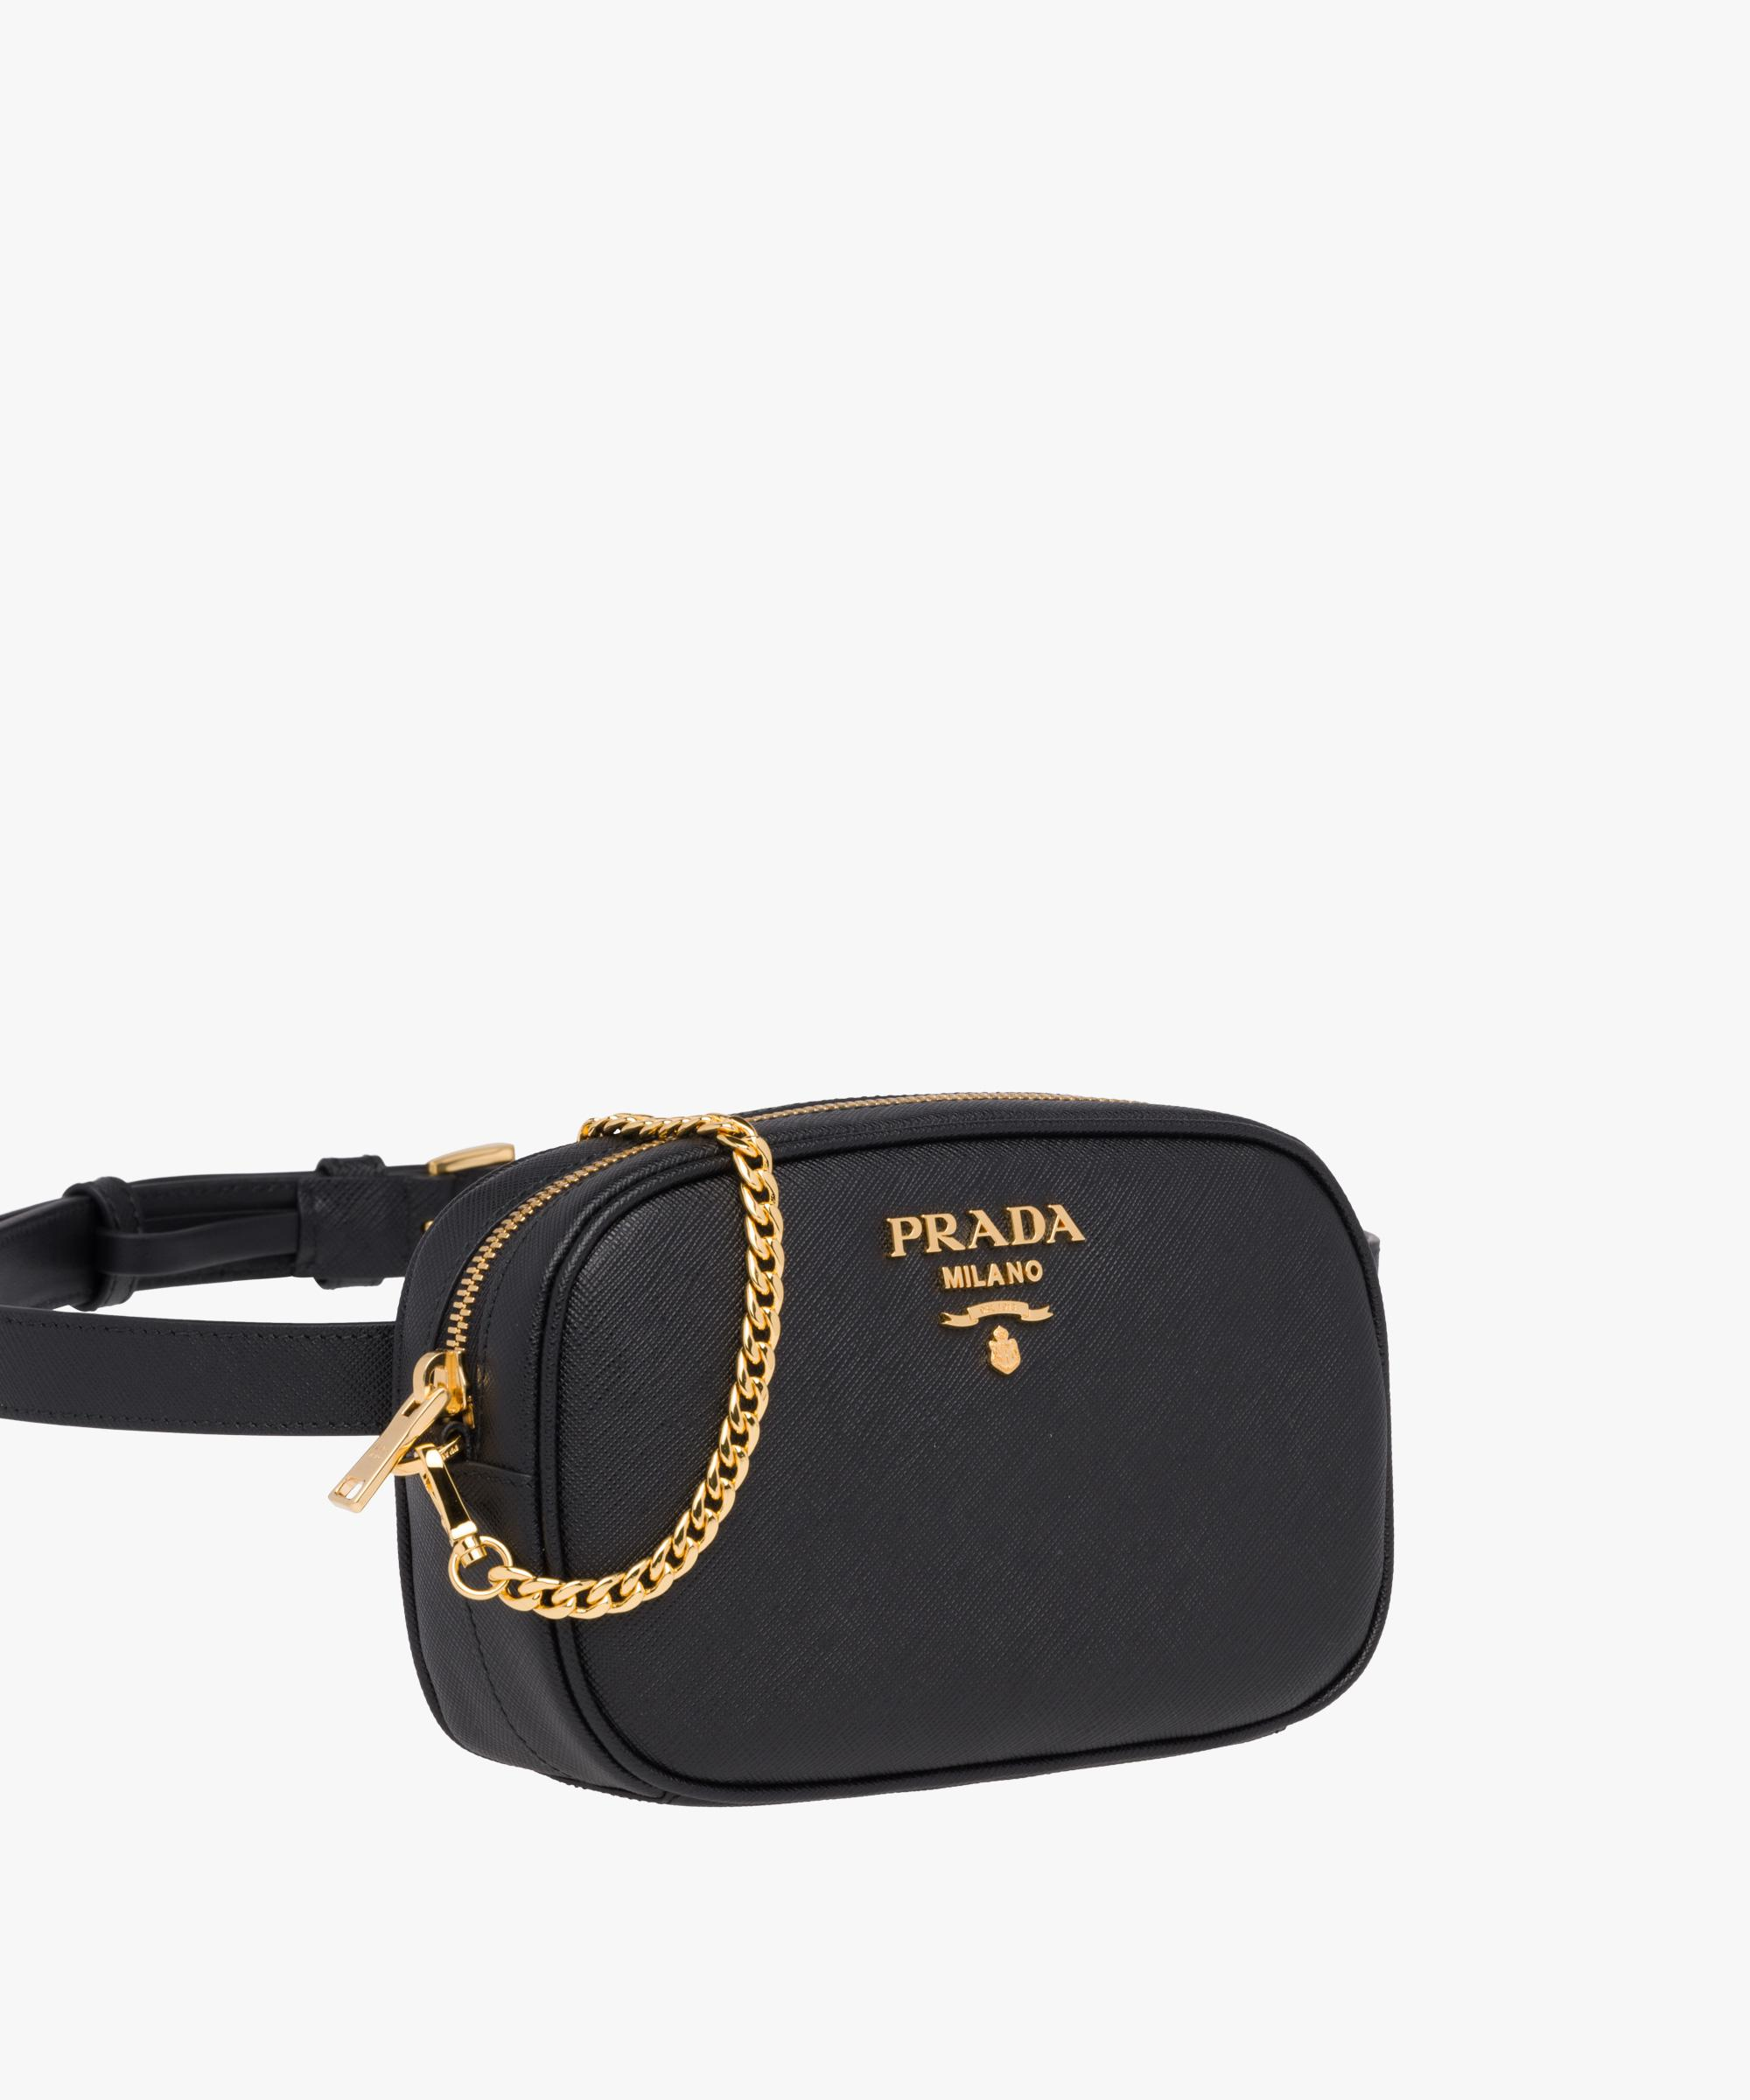 6d056caed5 Prada Black Saffiano Leather Belt Bag